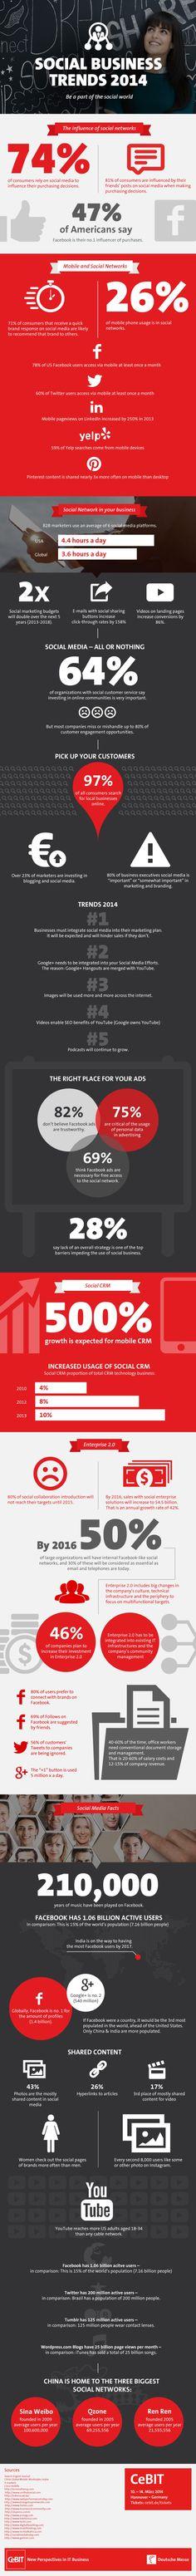 Social Business Trends 2014 - #SocialMedia #SocialNetworks #Infographic